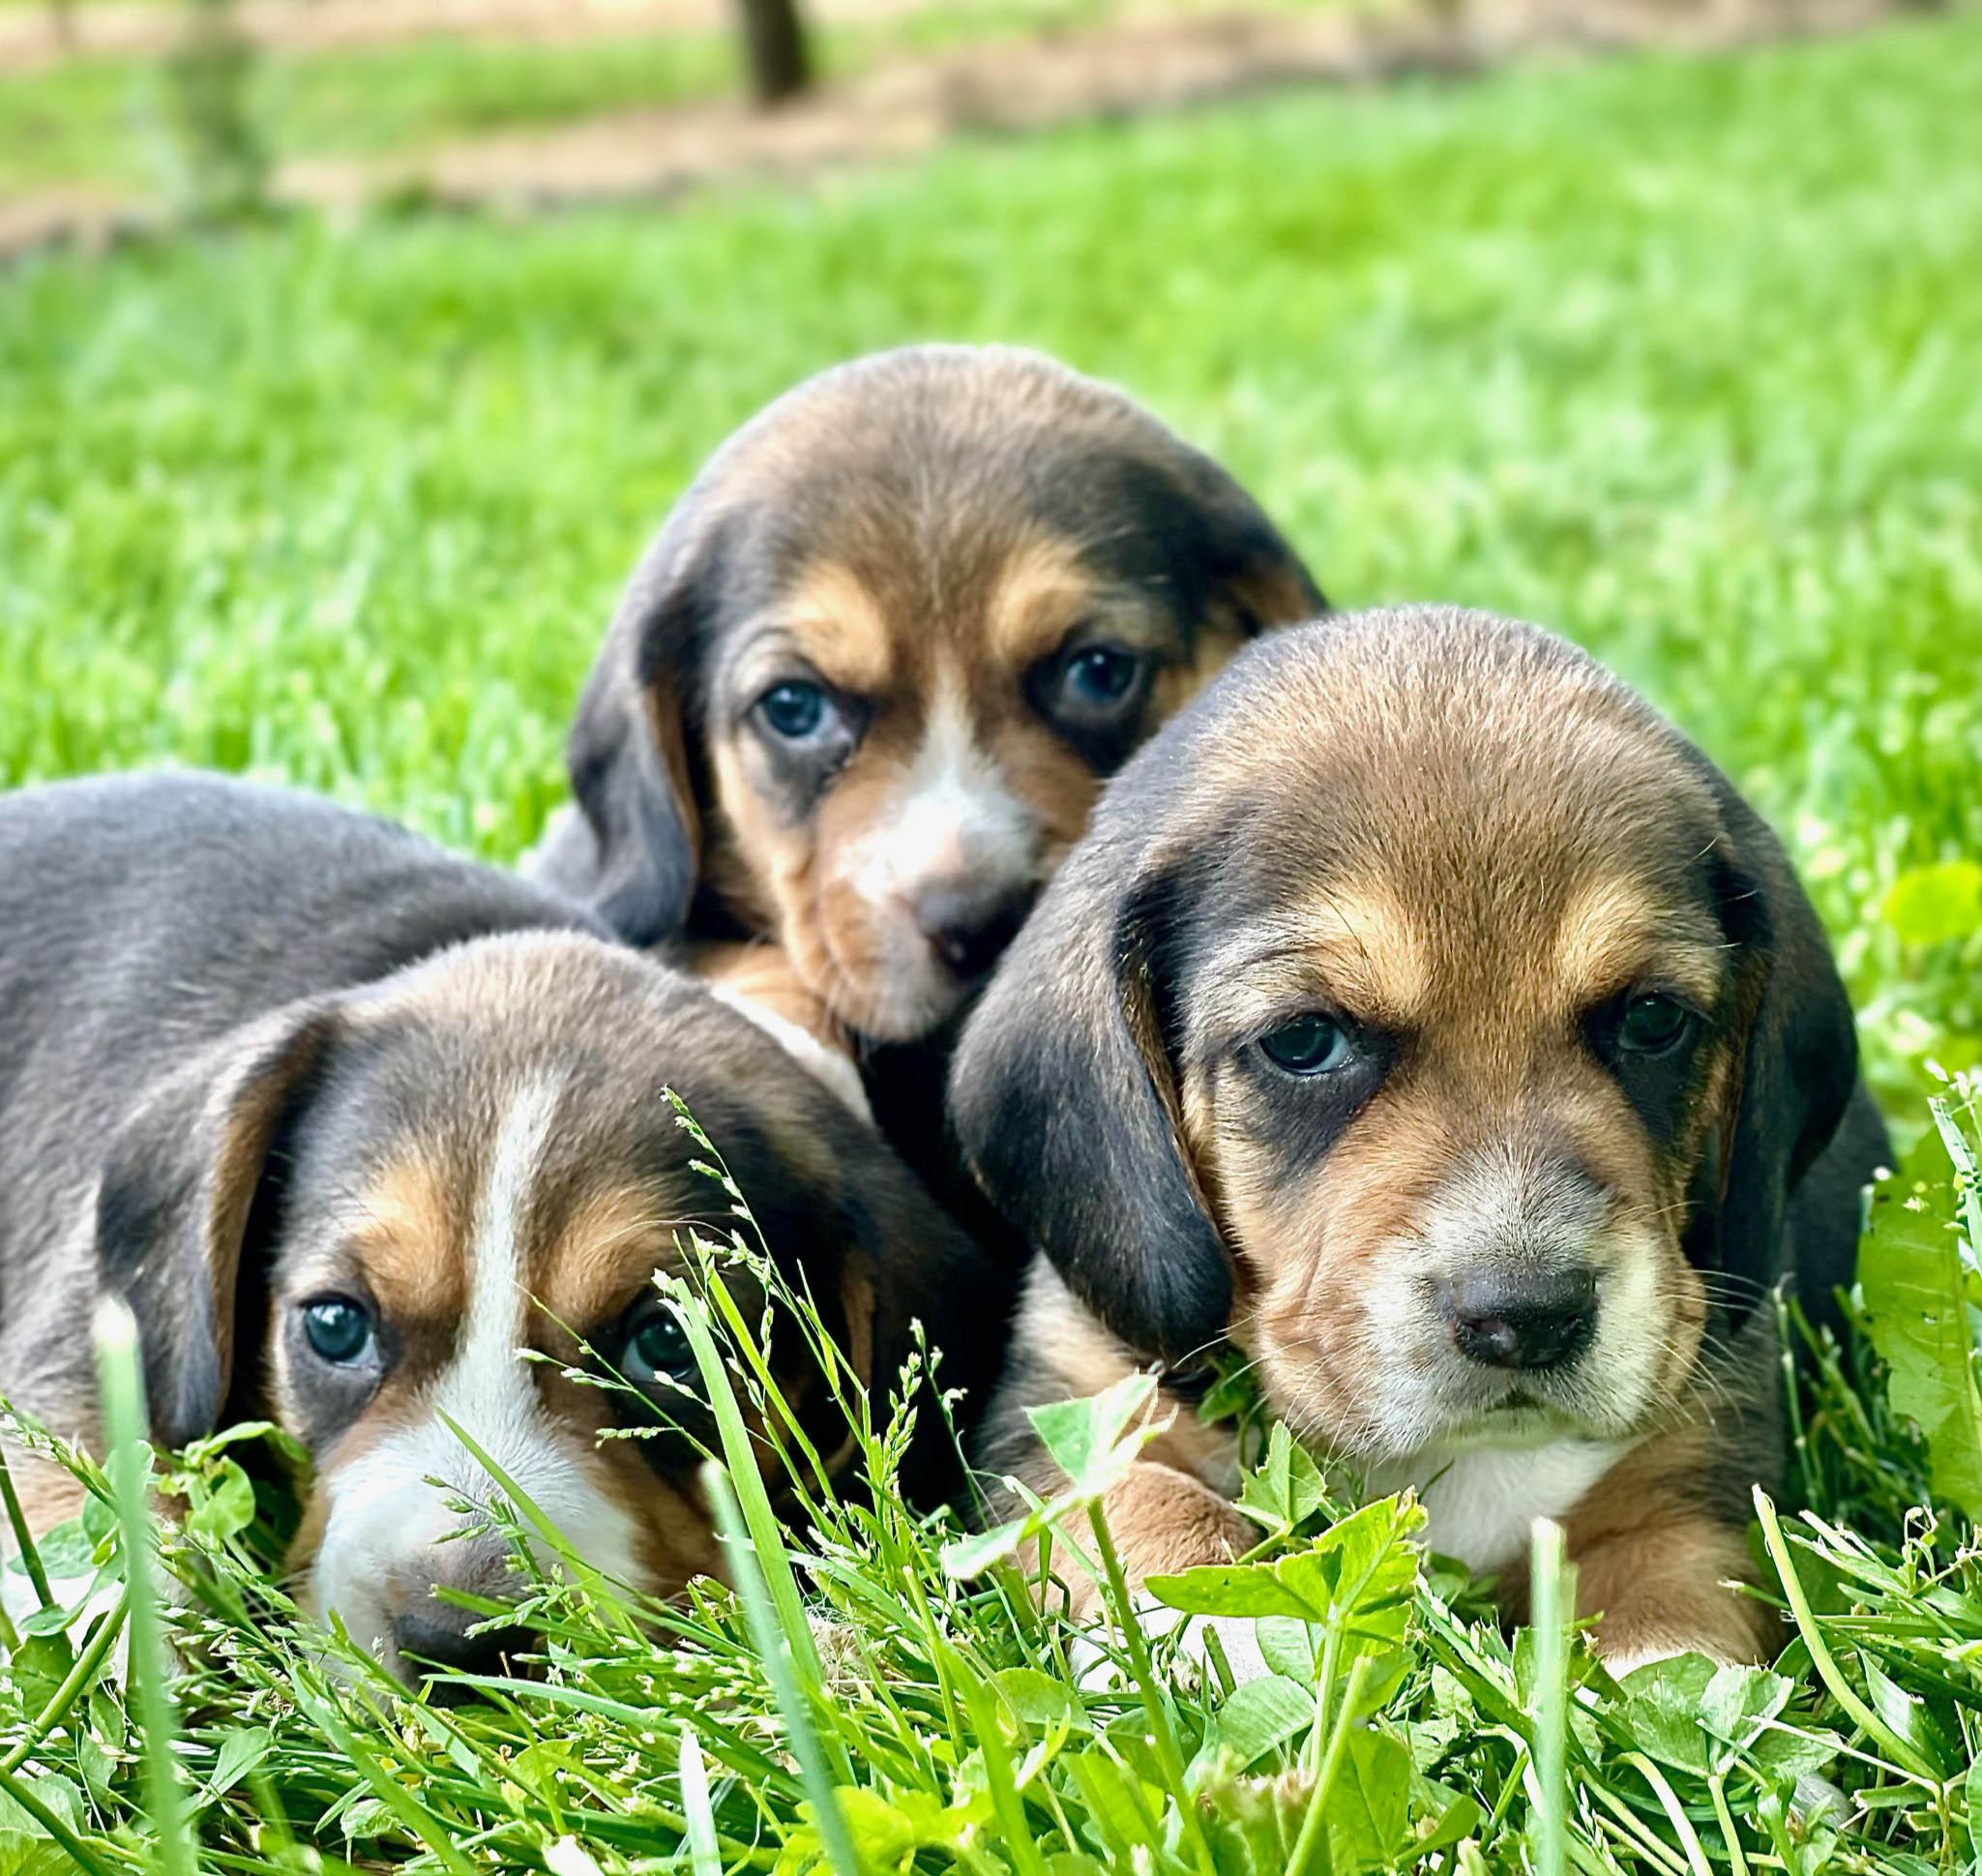 Beagle puppies cuddling